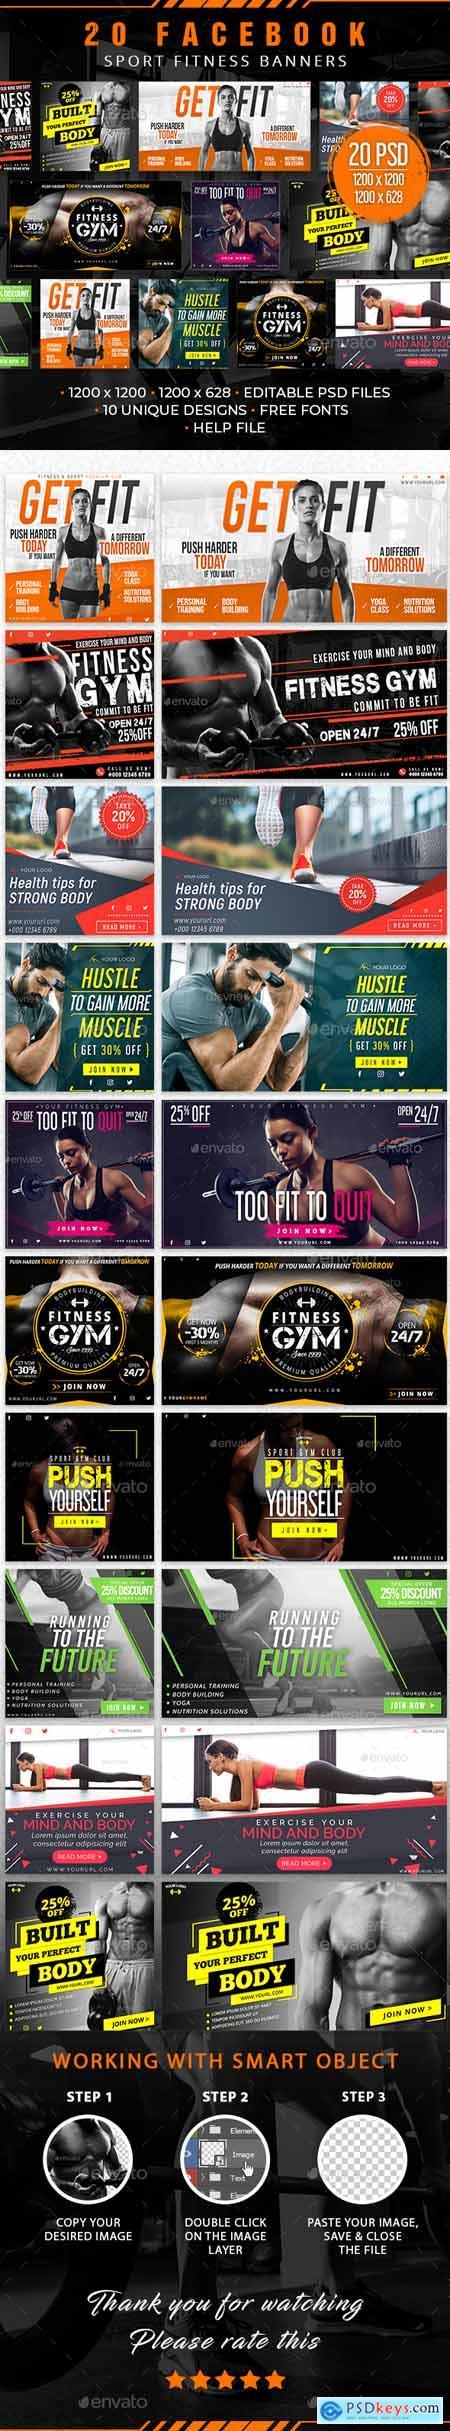 20 Facebook Sport Fitness Banners 30127784